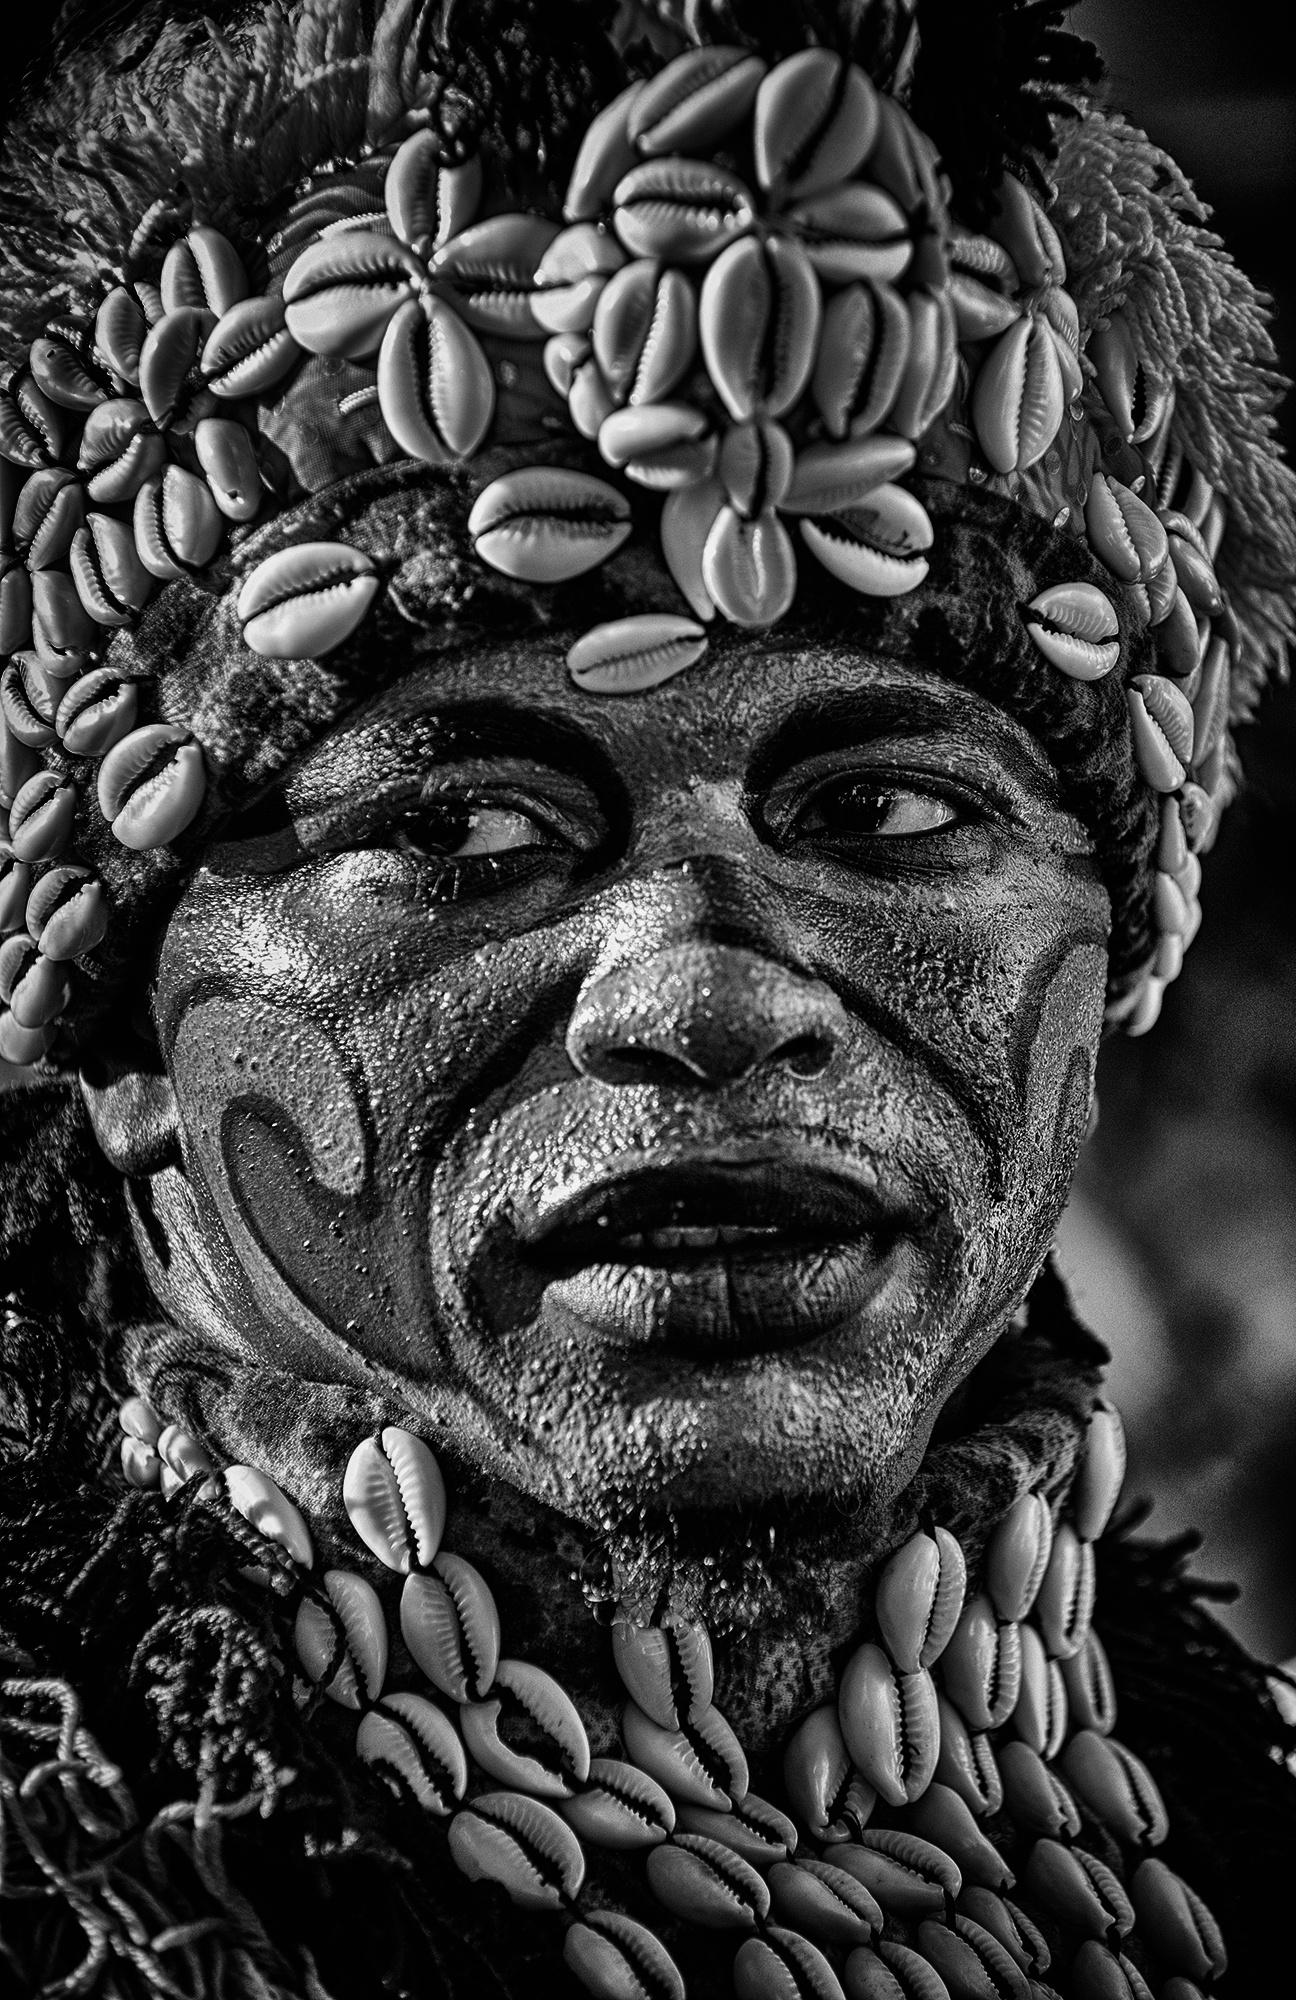 Man in Lisbon. by desmcmahon5